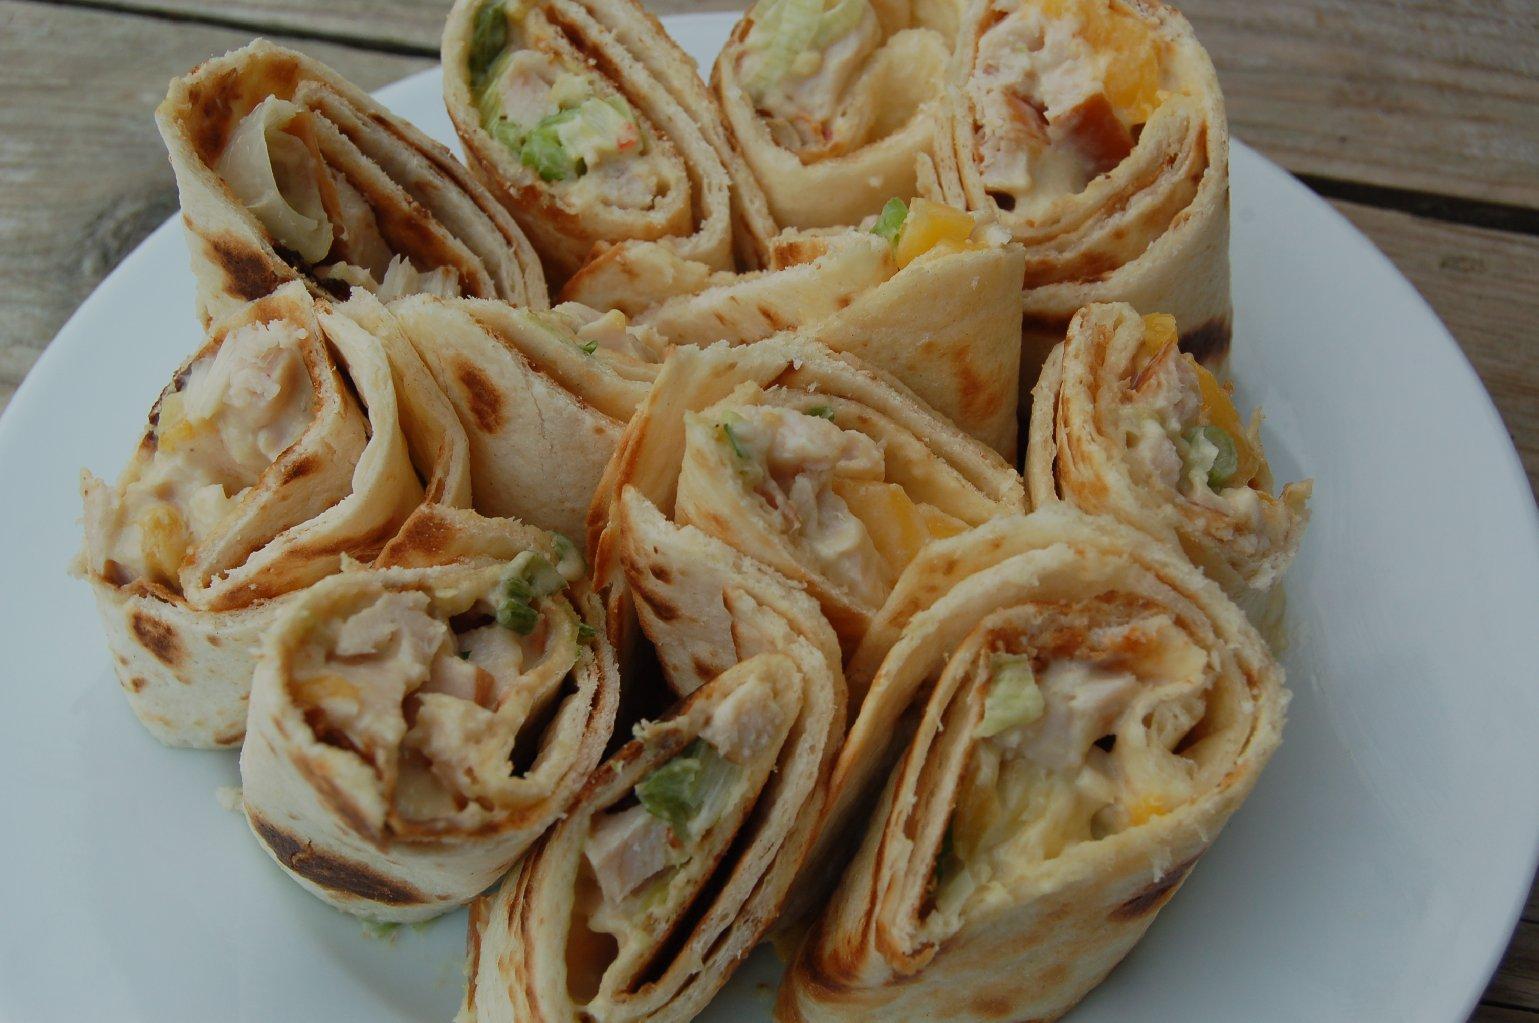 Genoeg Wraps met gerookte kip, avocado en mango - FOOD I LOVE @SB43